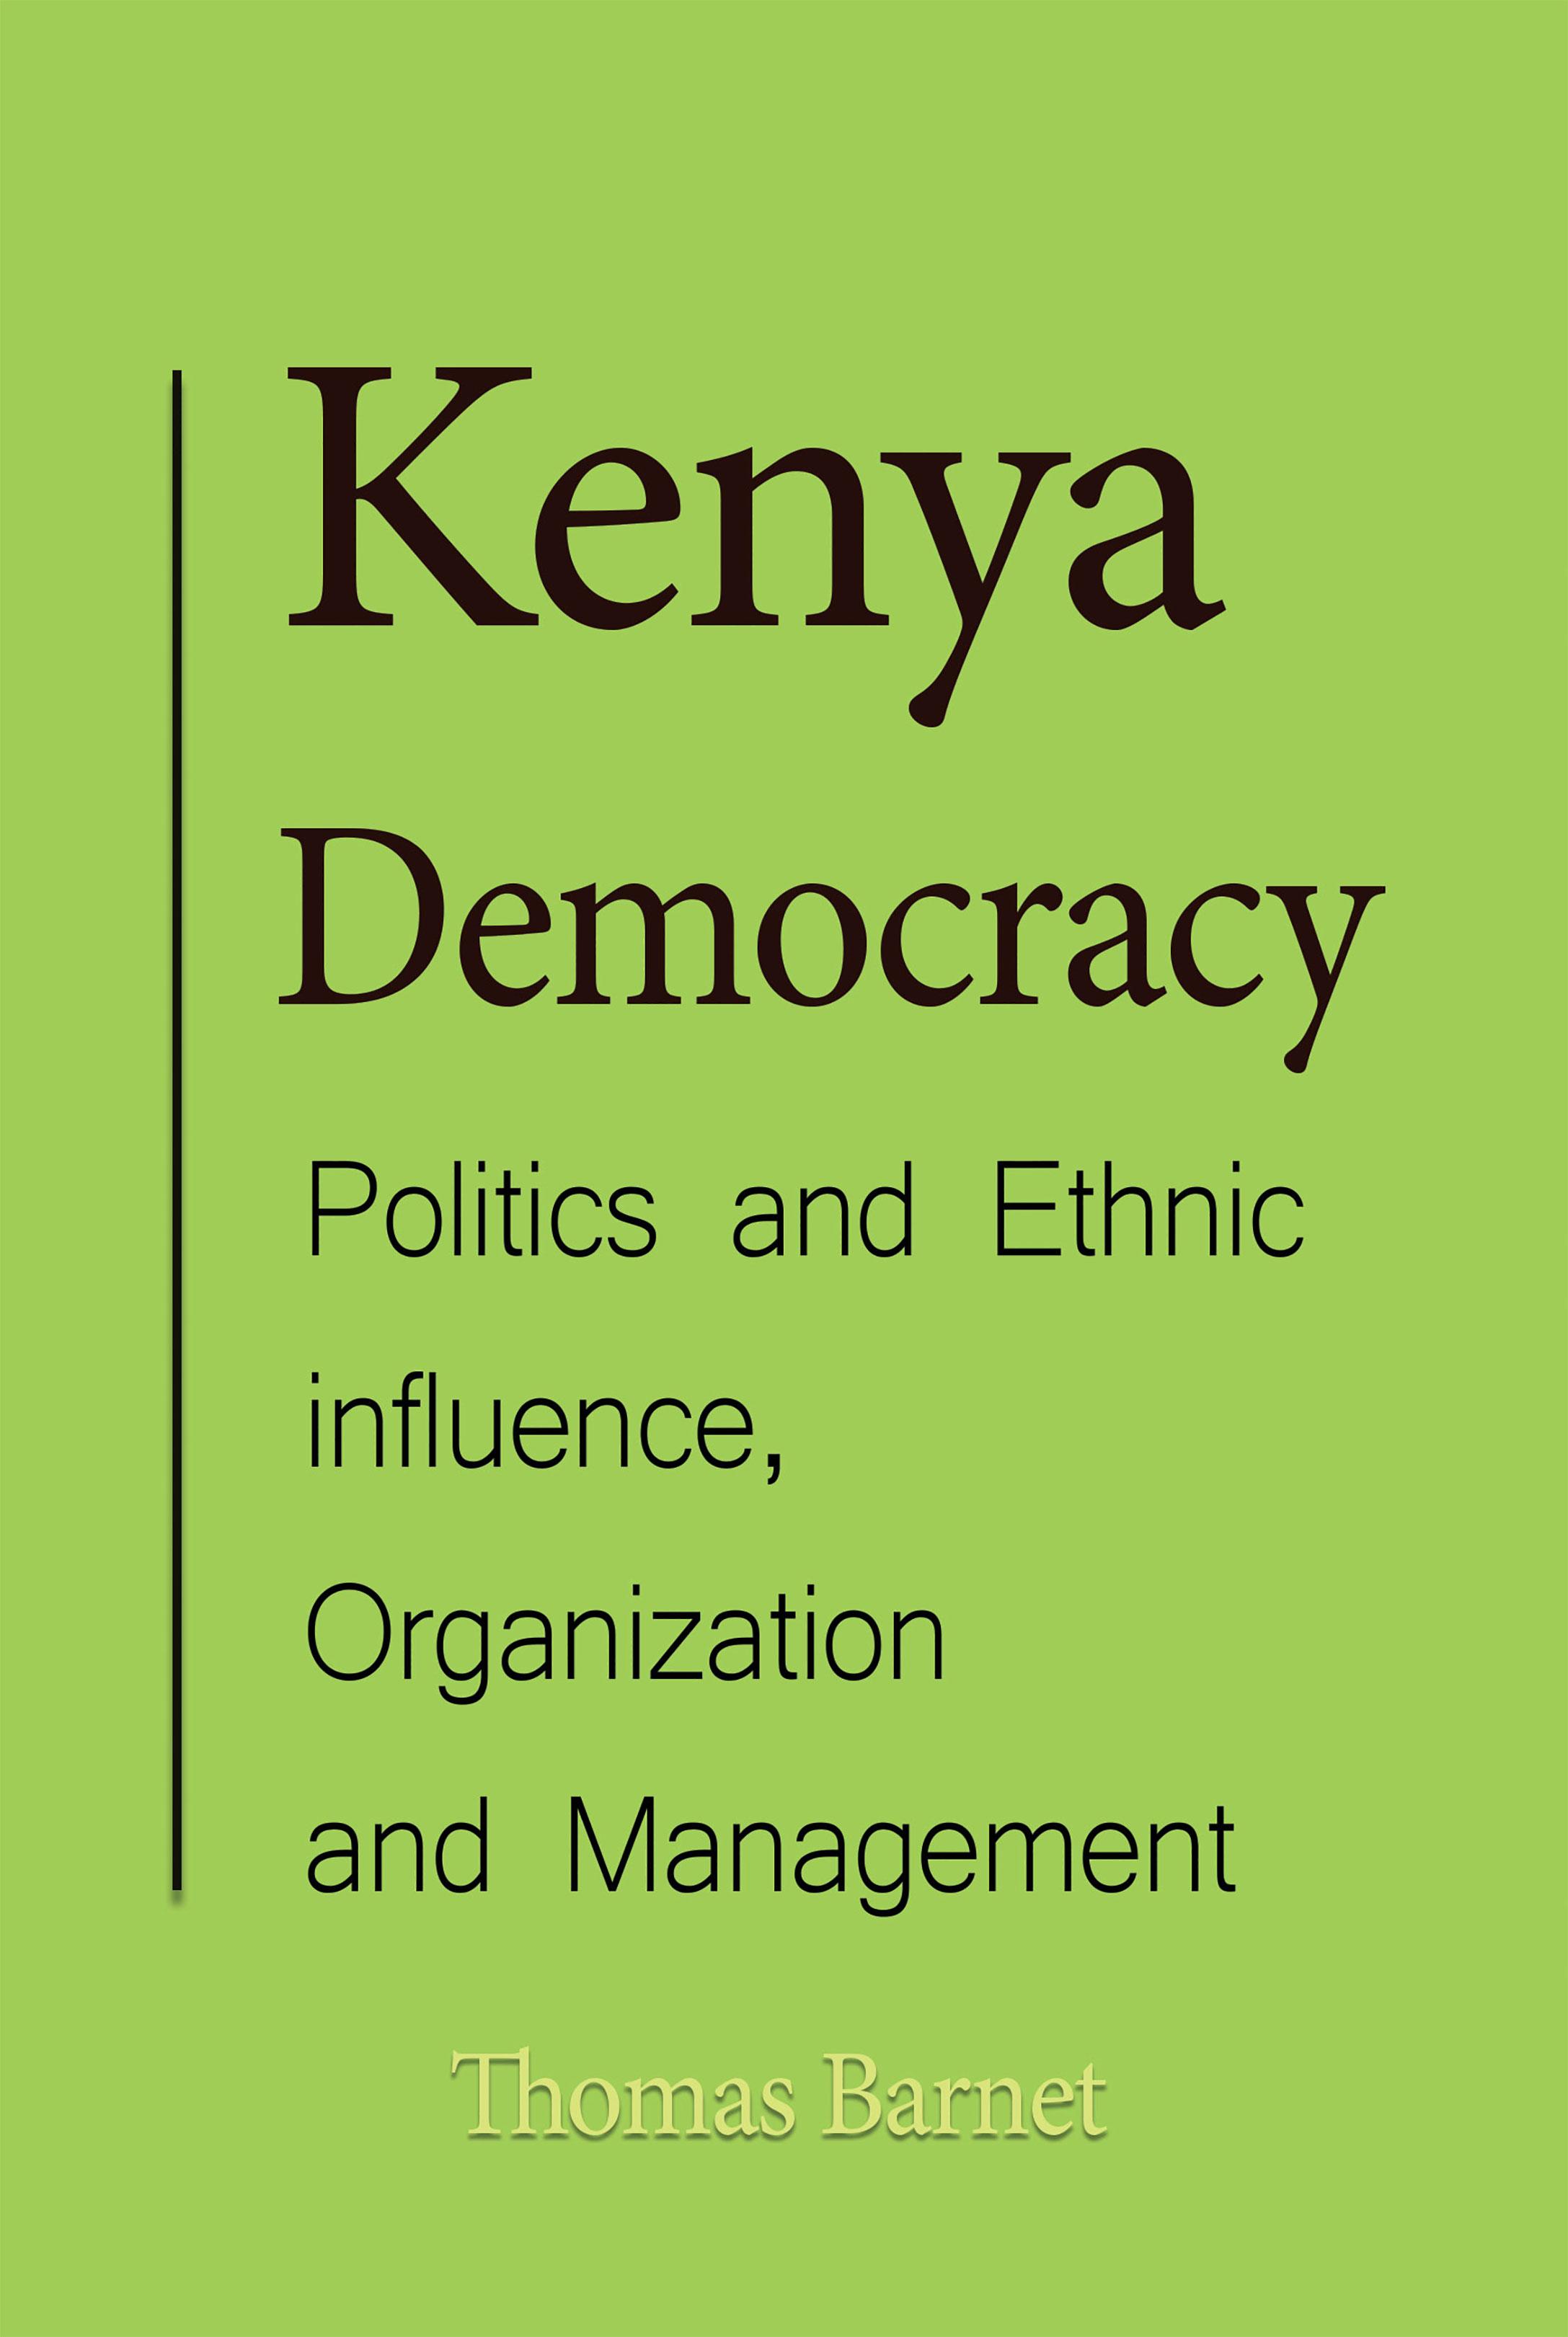 media influence kenyan politiccs